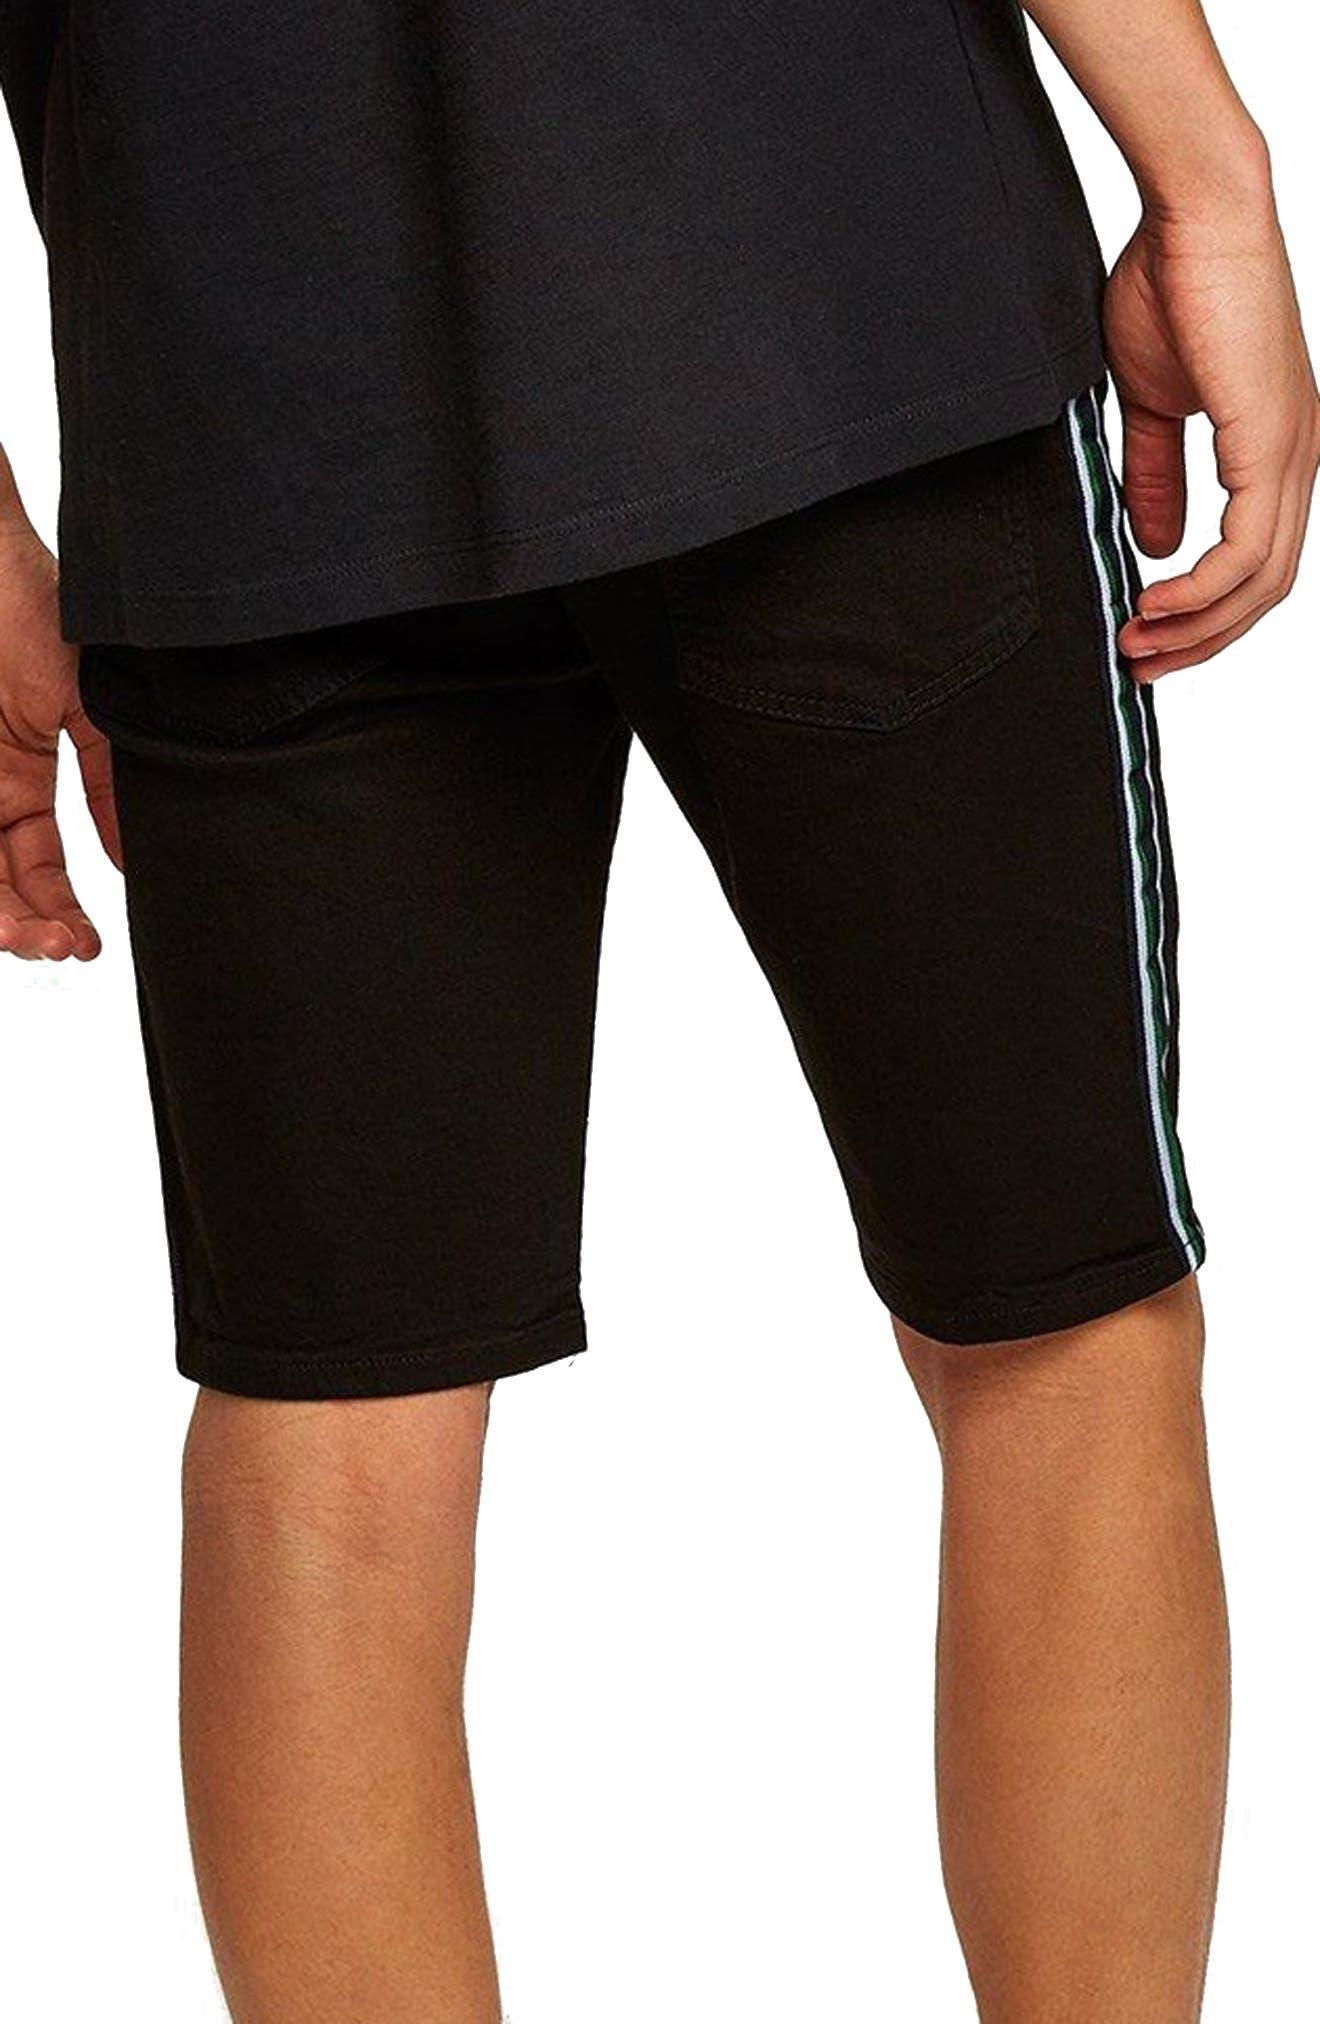 Tape Stretch Skinny Fit Denim Shorts,                             Alternate thumbnail 2, color,                             001